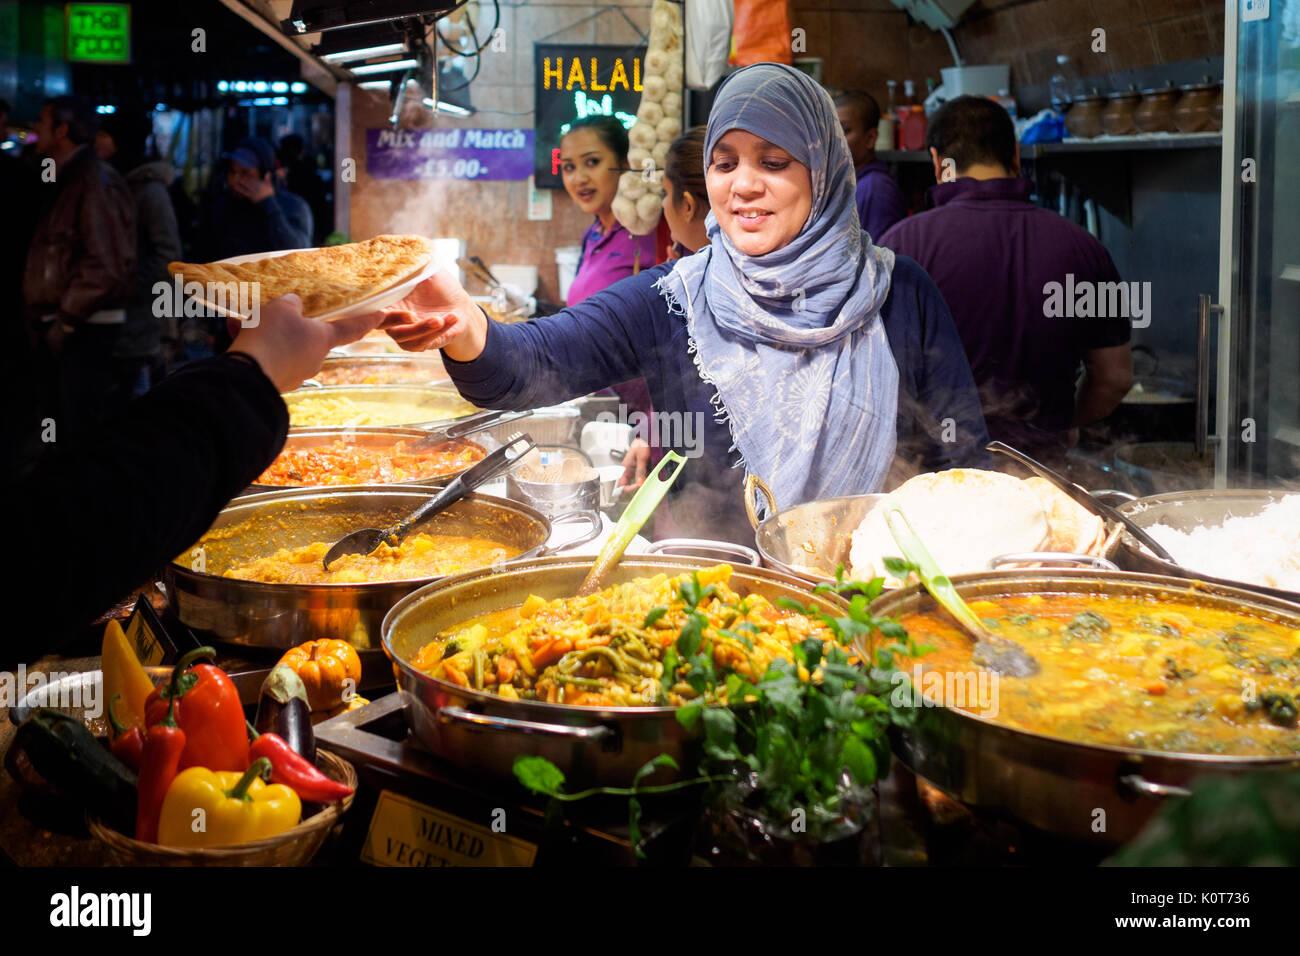 Kings Fast Food Indian Street Food